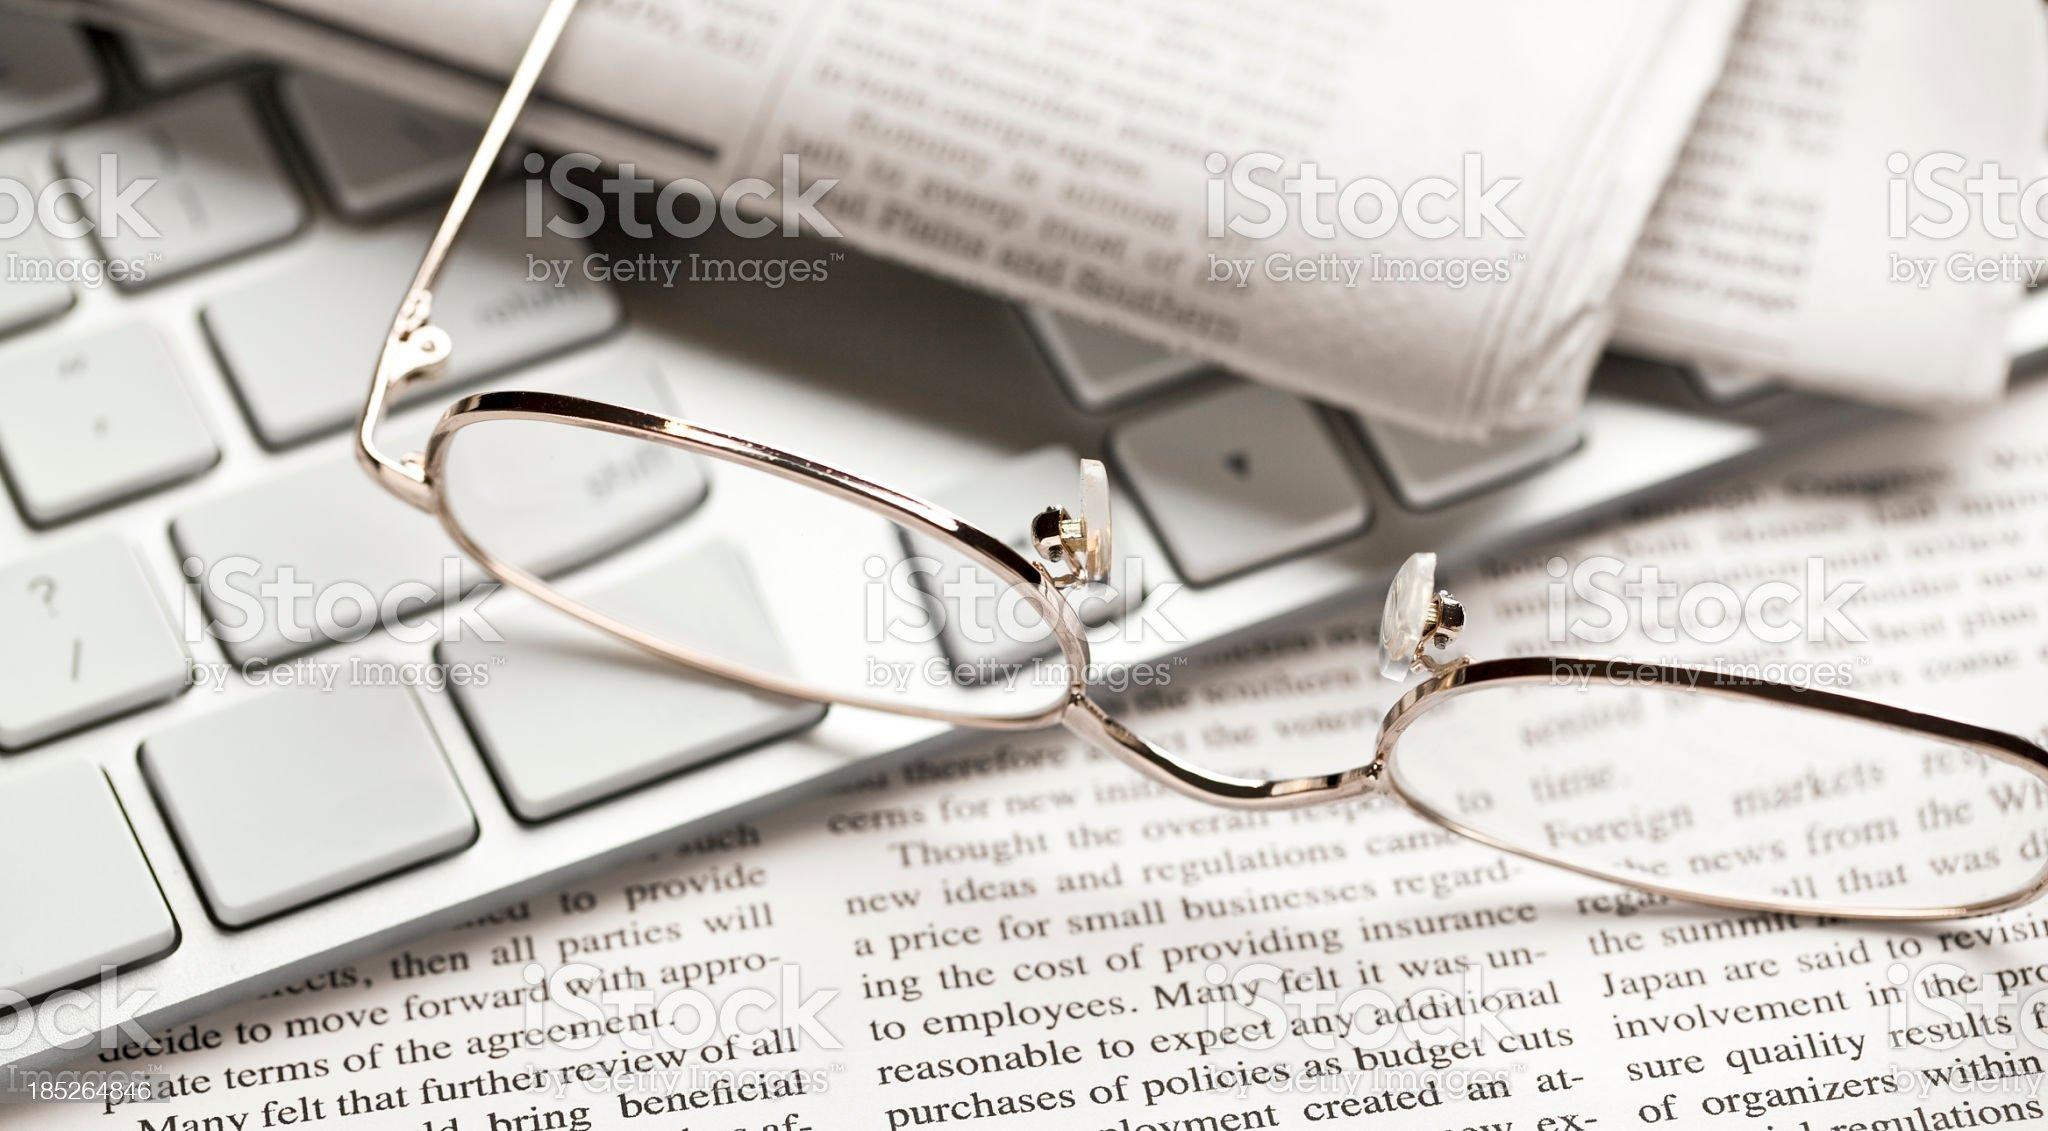 News royalty-free stock photo